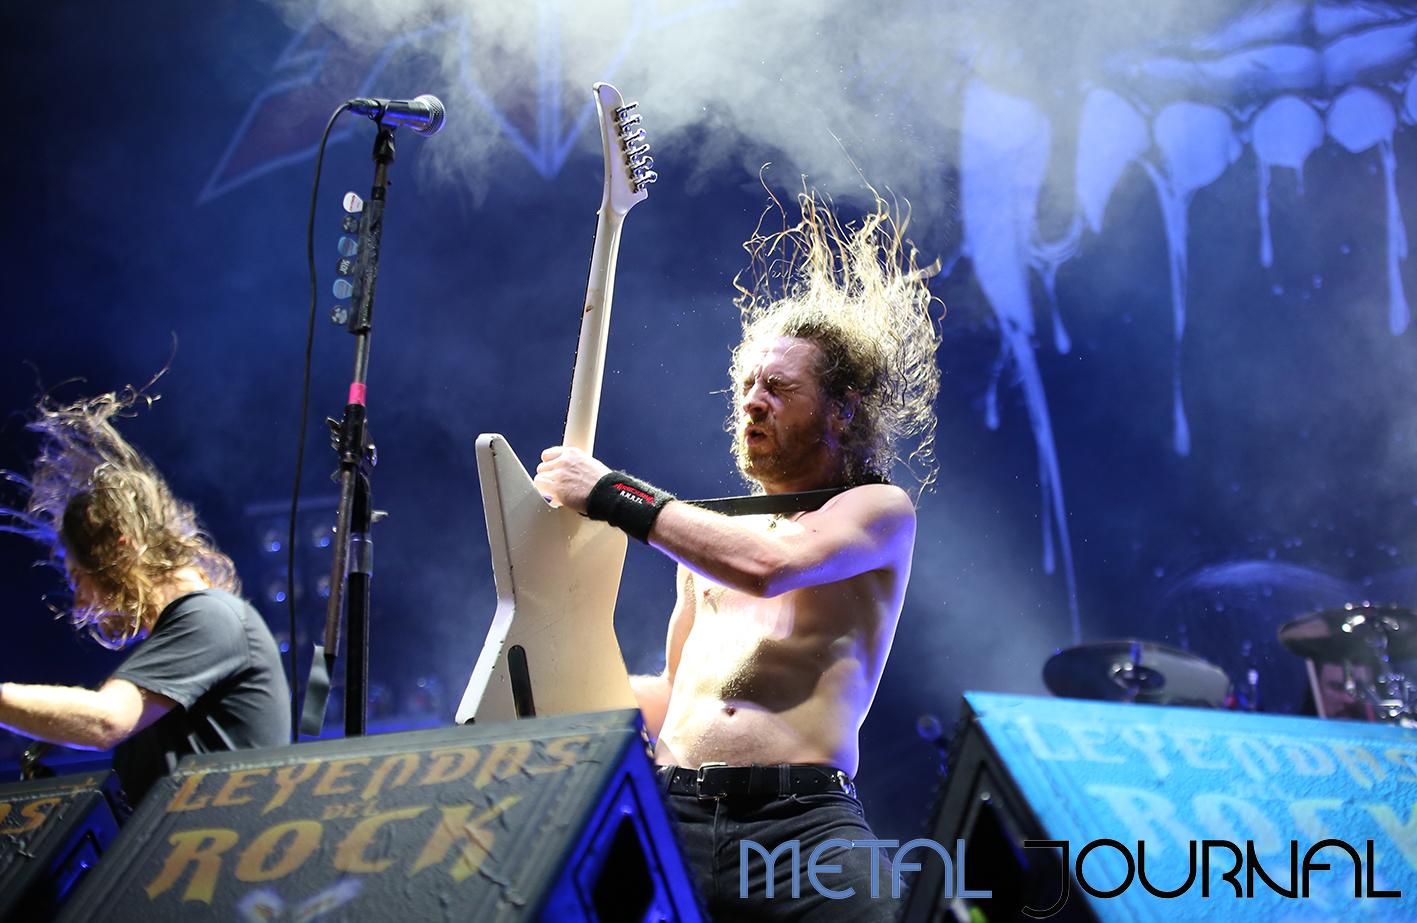 airbourne - leyendas del rock 2019 metal journal pic 6